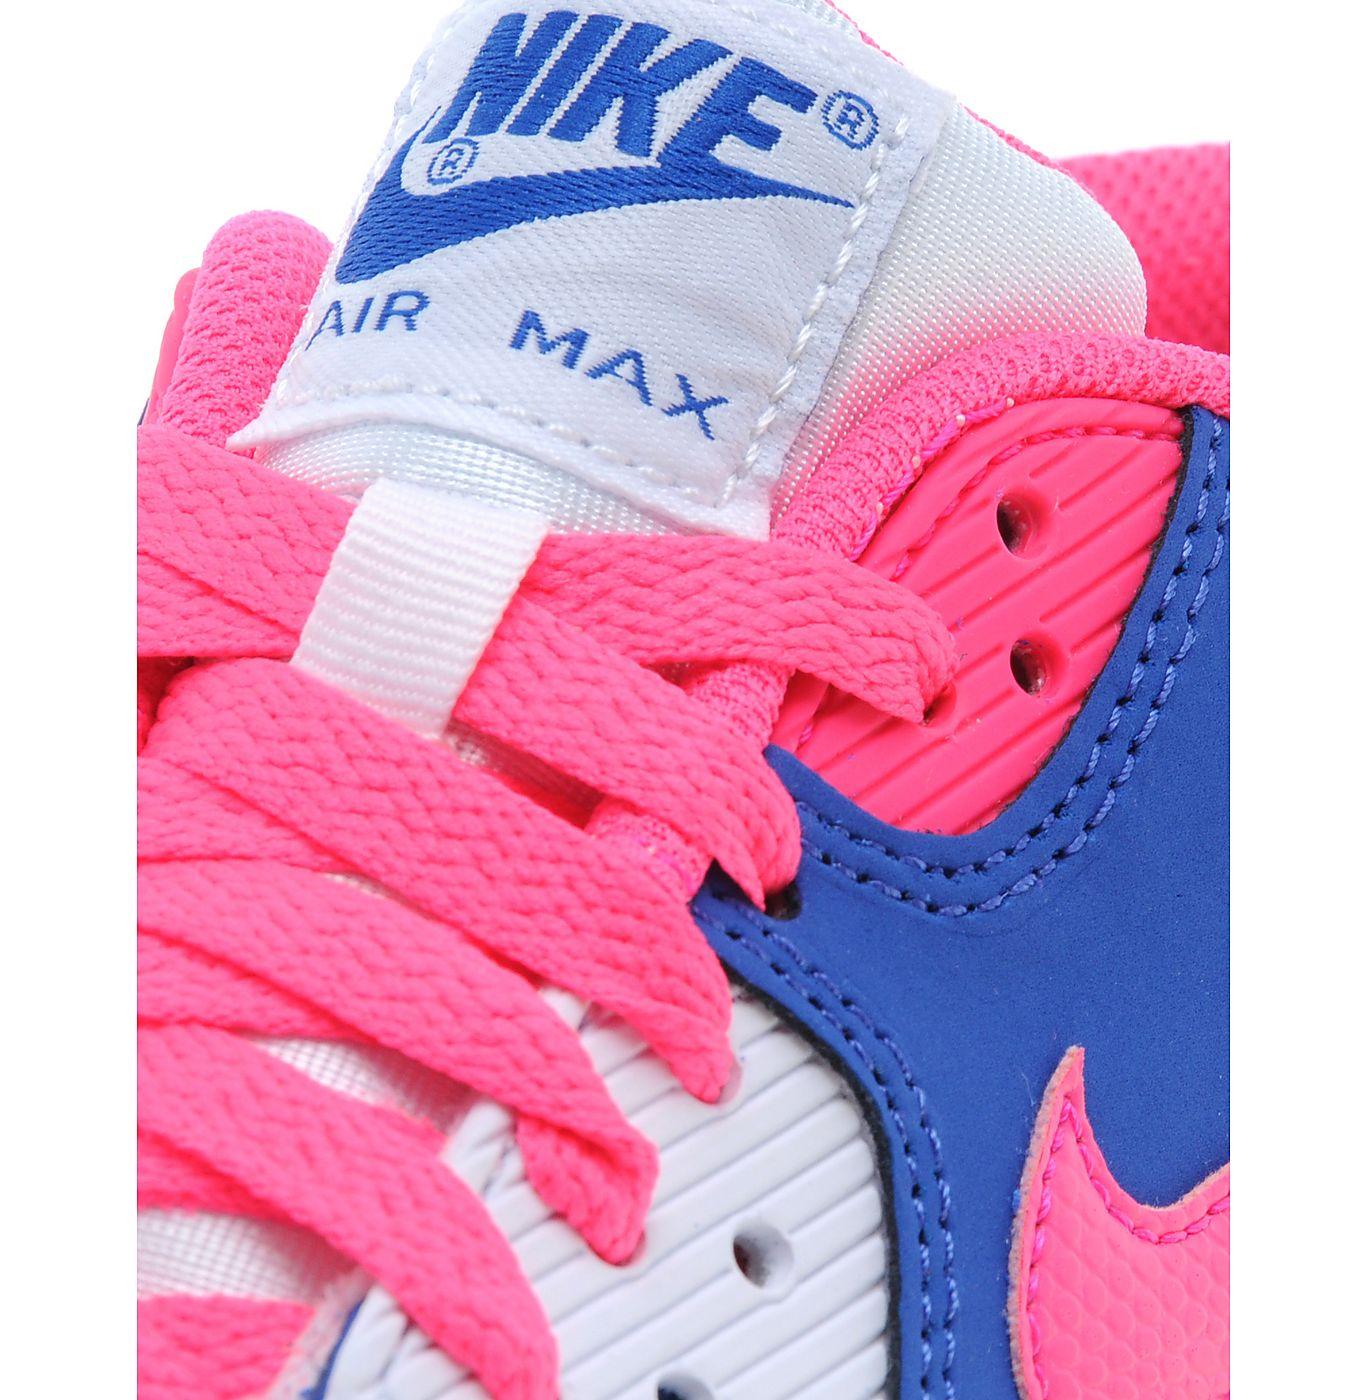 Nike Air Max 90 Gs 2007 Blå Ungdoms Trenere Sko XFvzRhcUIS